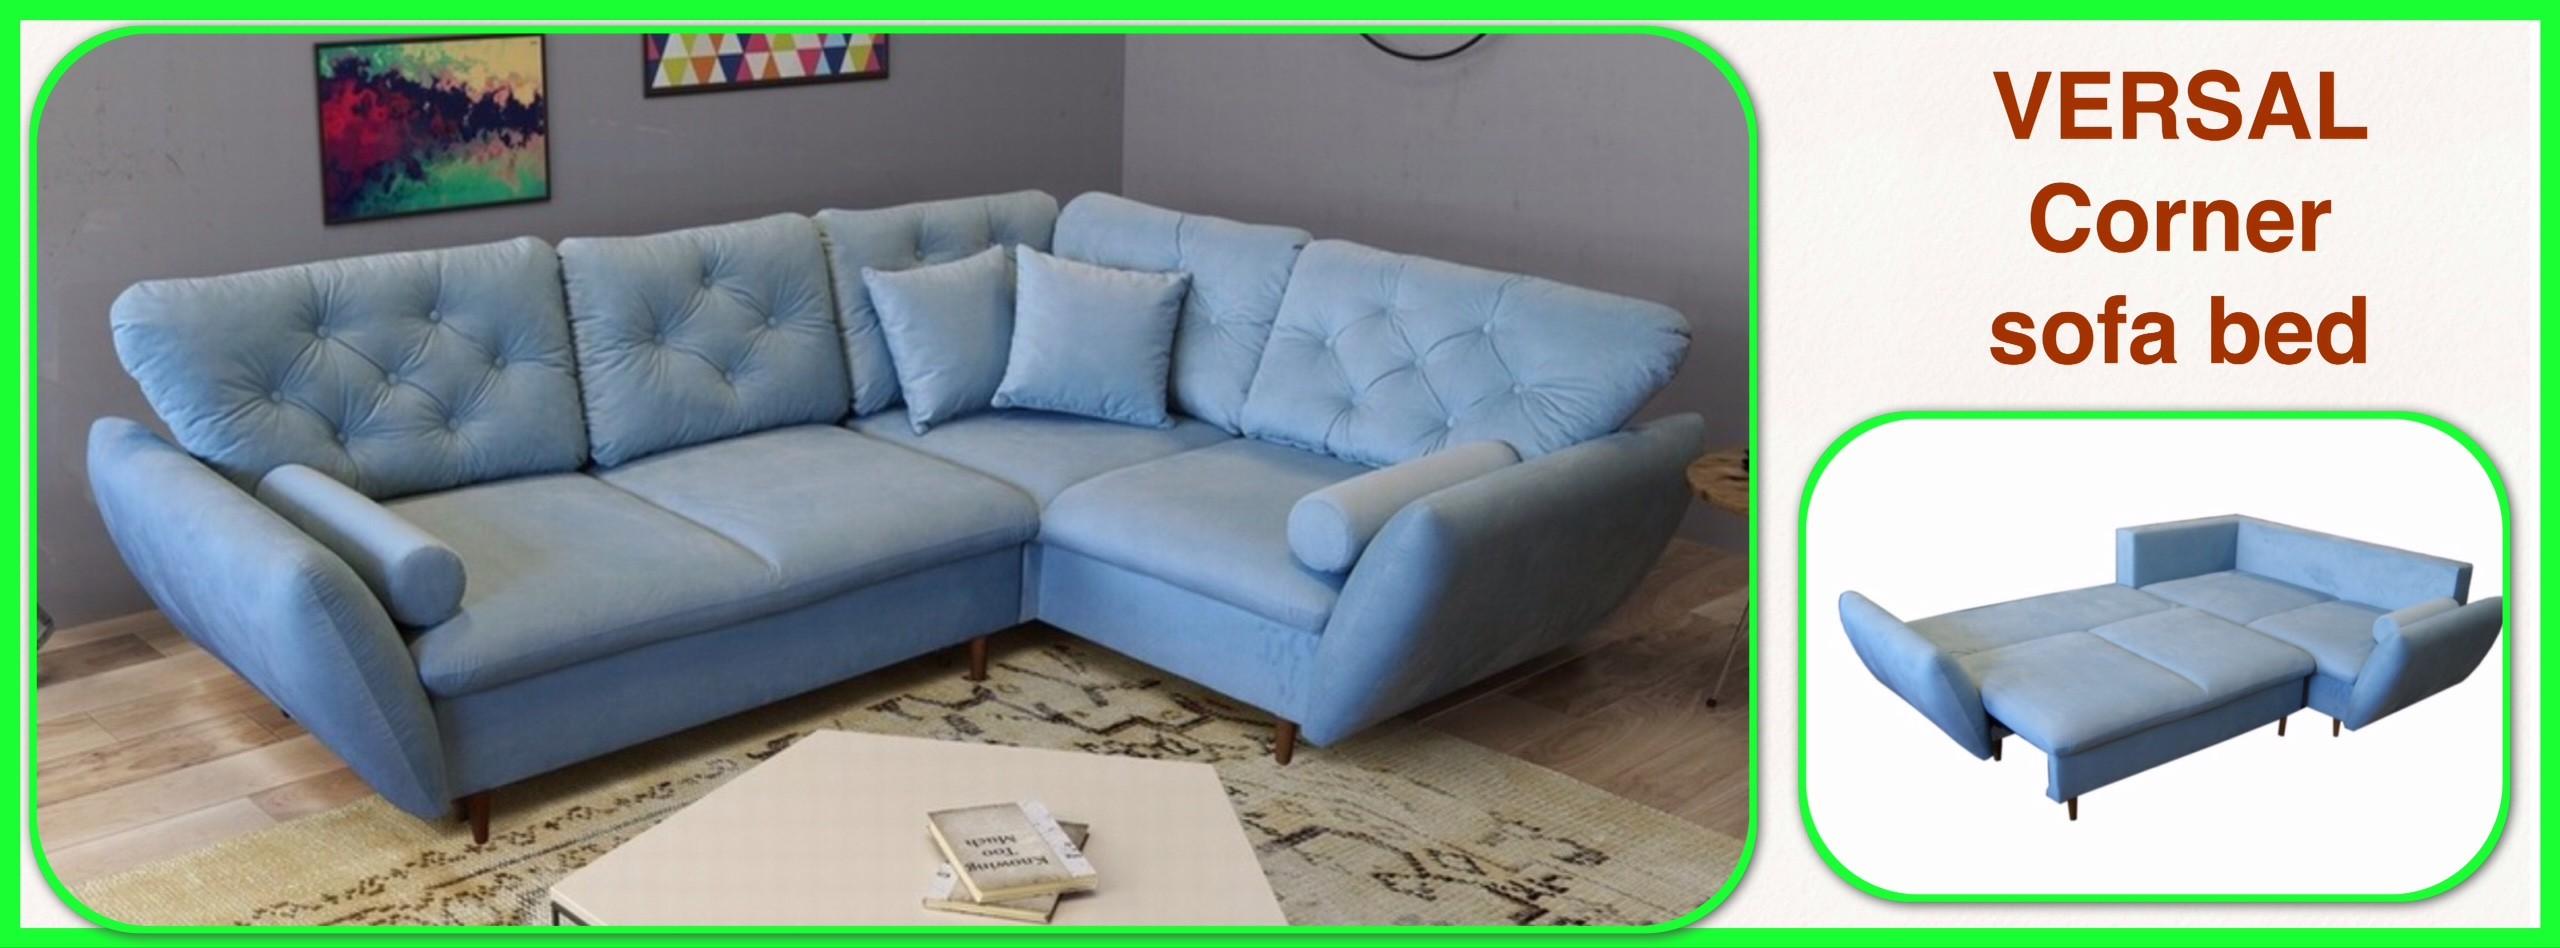 VERSAL  - Corner Sofa Bed